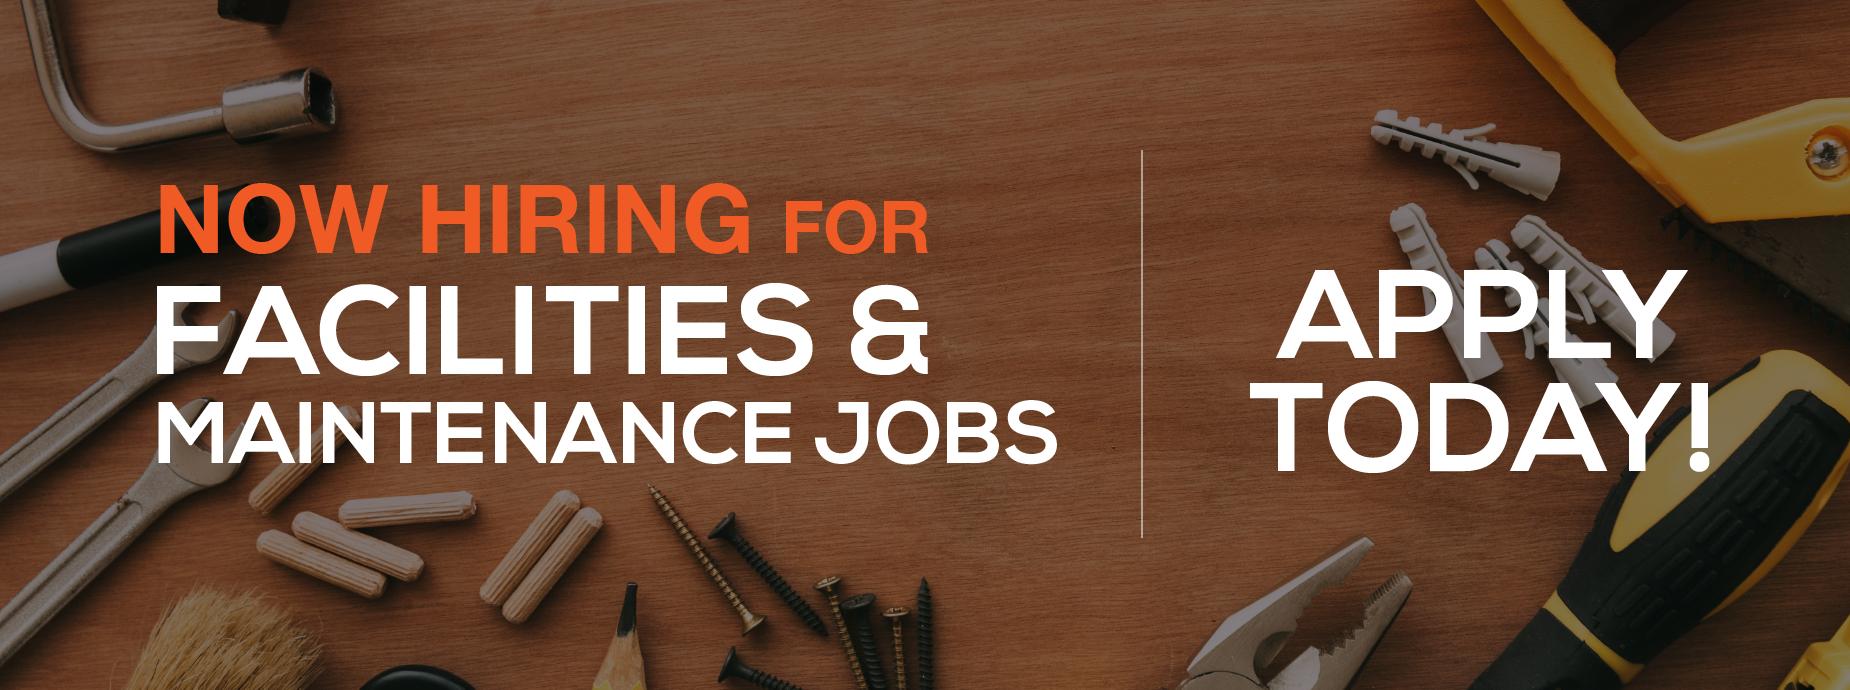 Now Hiring for facilities & Maintenance Jobs